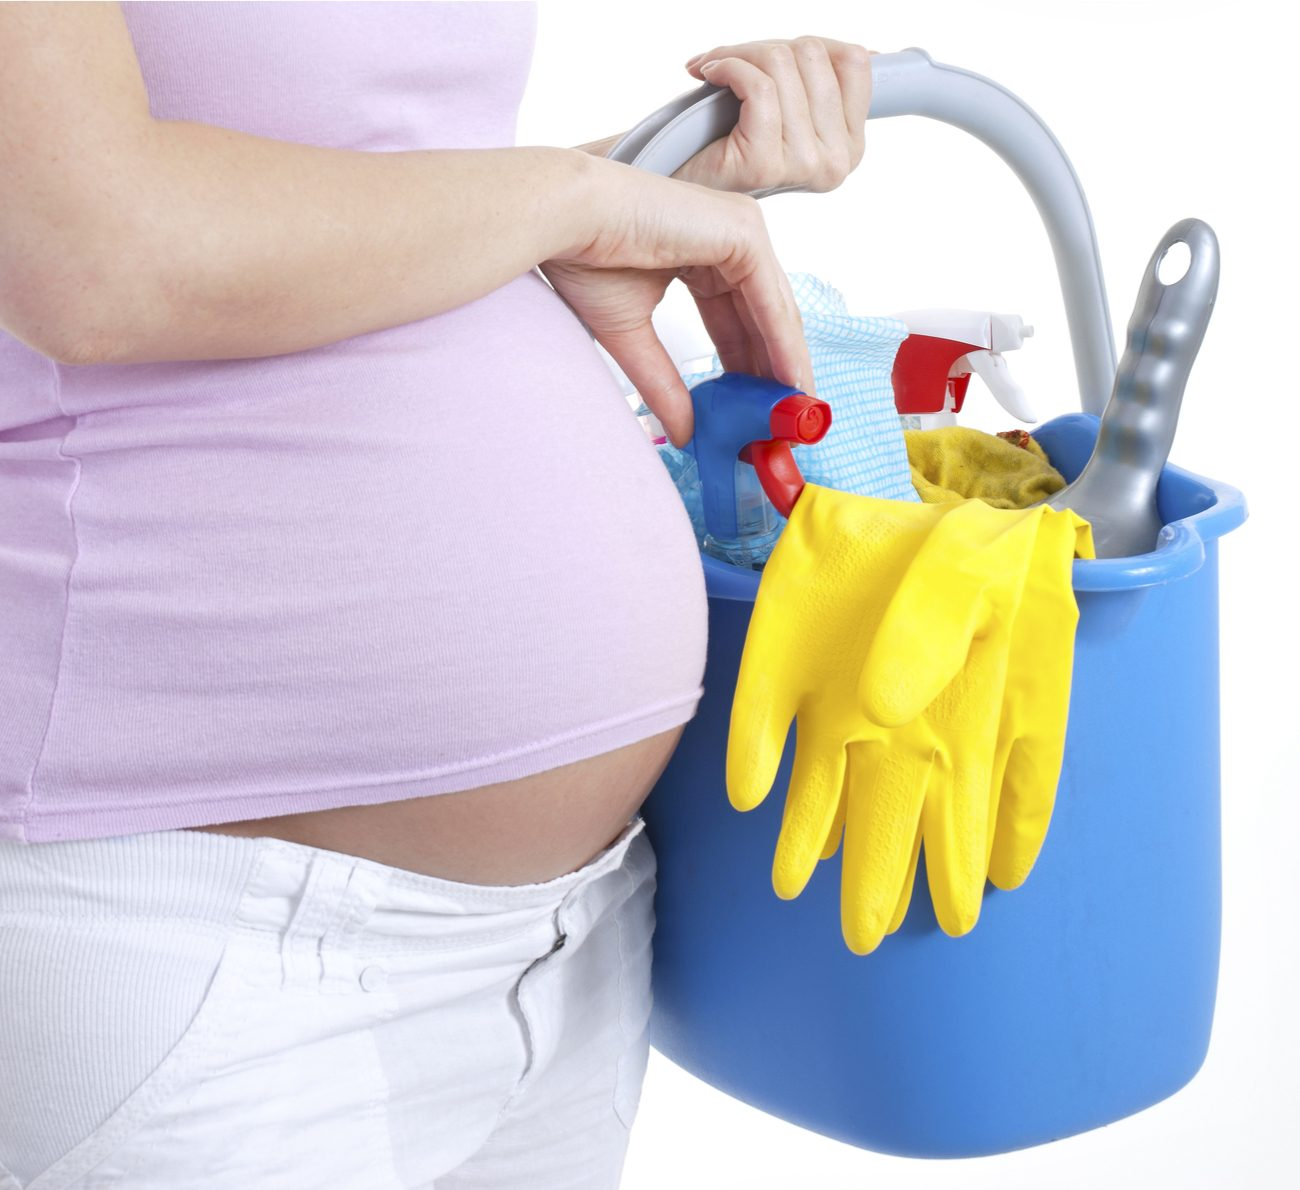 grávida pode fazer faxina